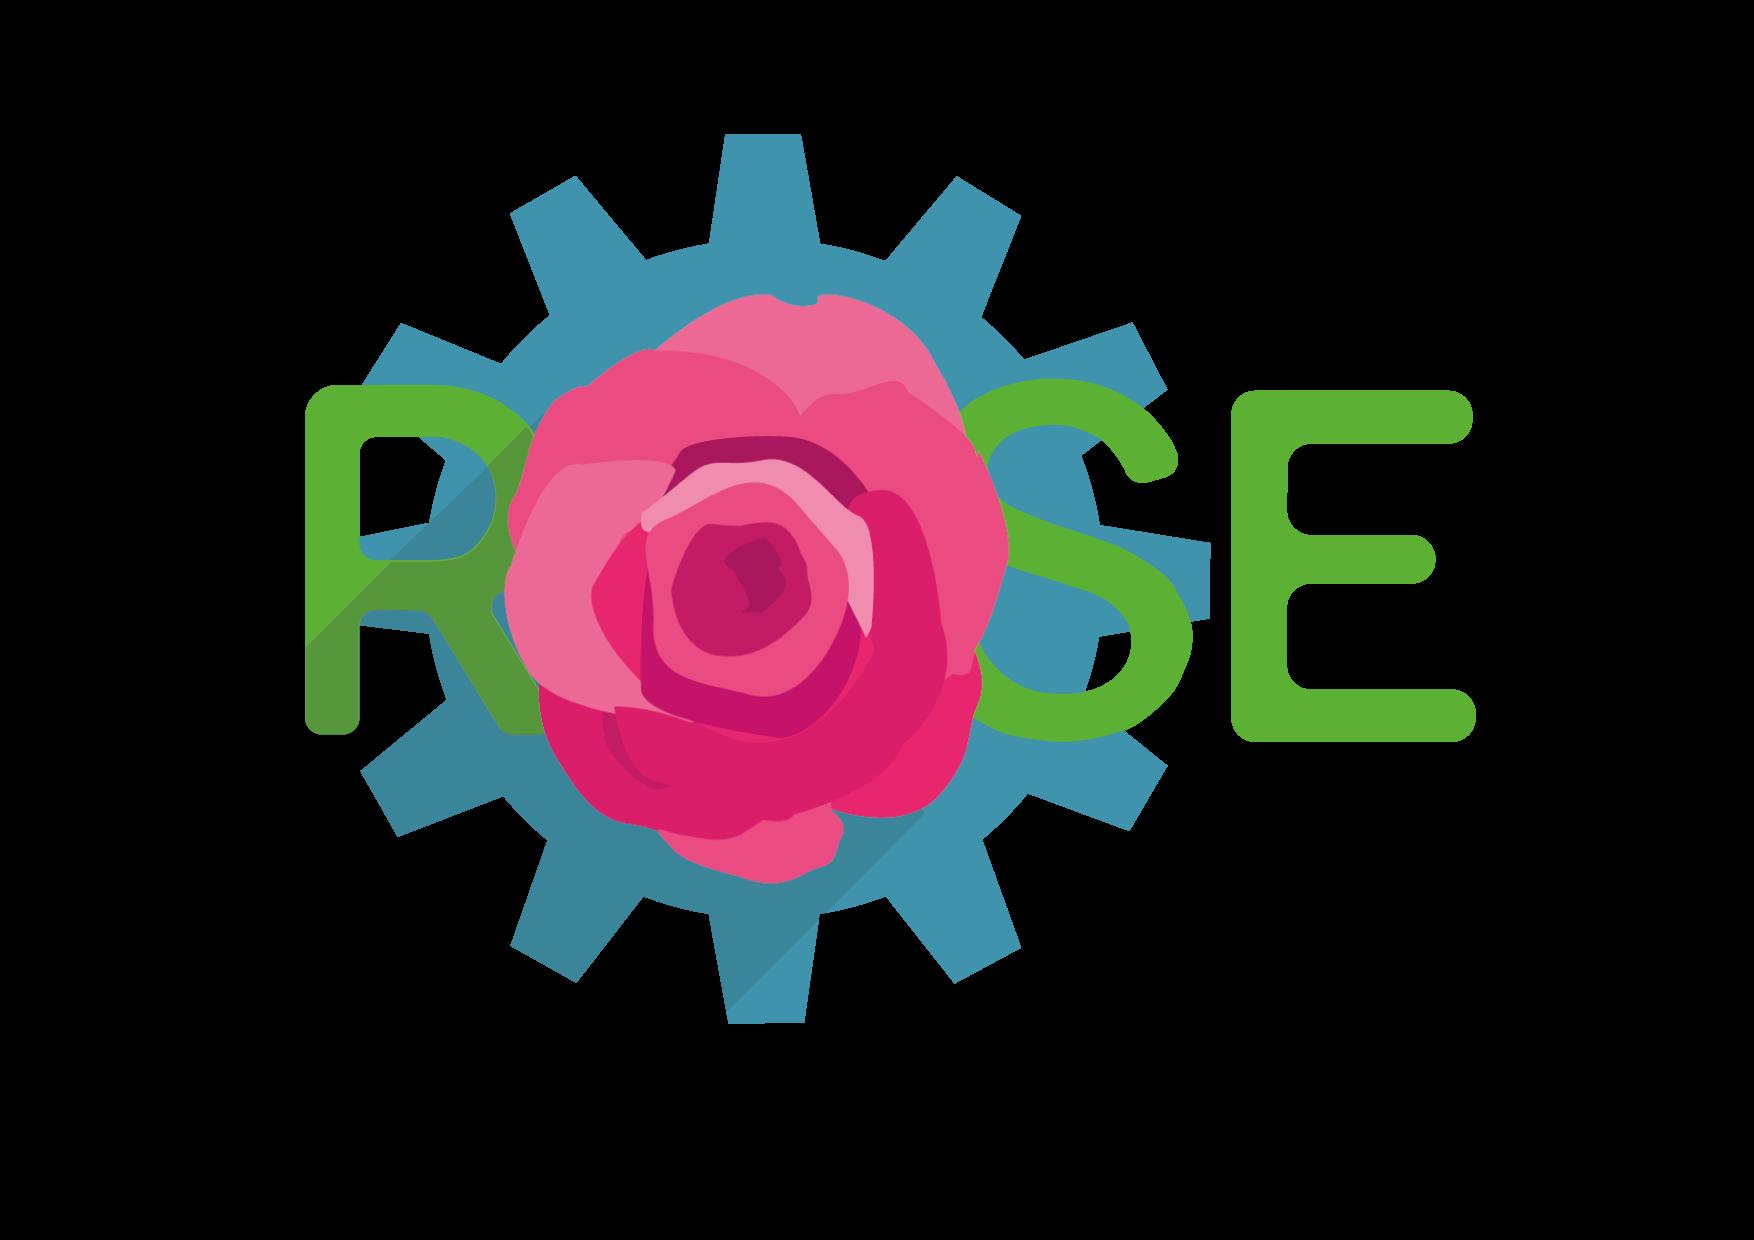 Engineering clipart stem education stem. Rose robotics opportunities to